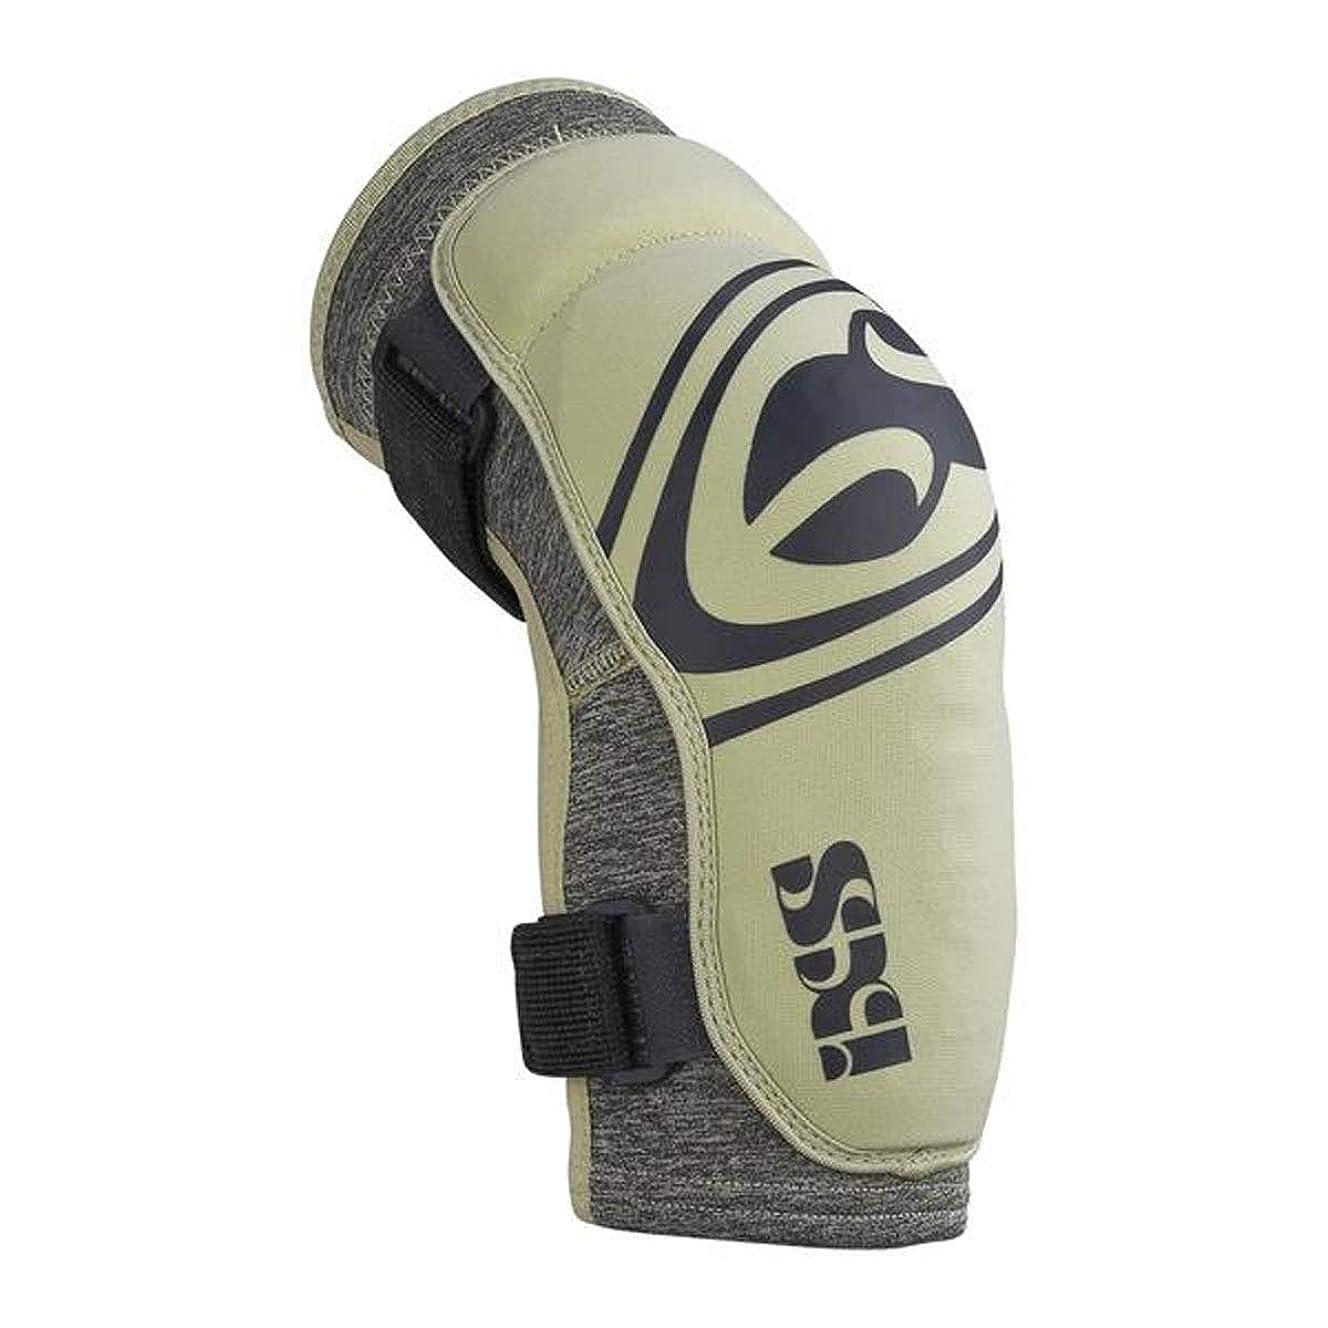 IXS Adult Carve EVO+ Elbow Guard - Camel - 482-510-6614-803